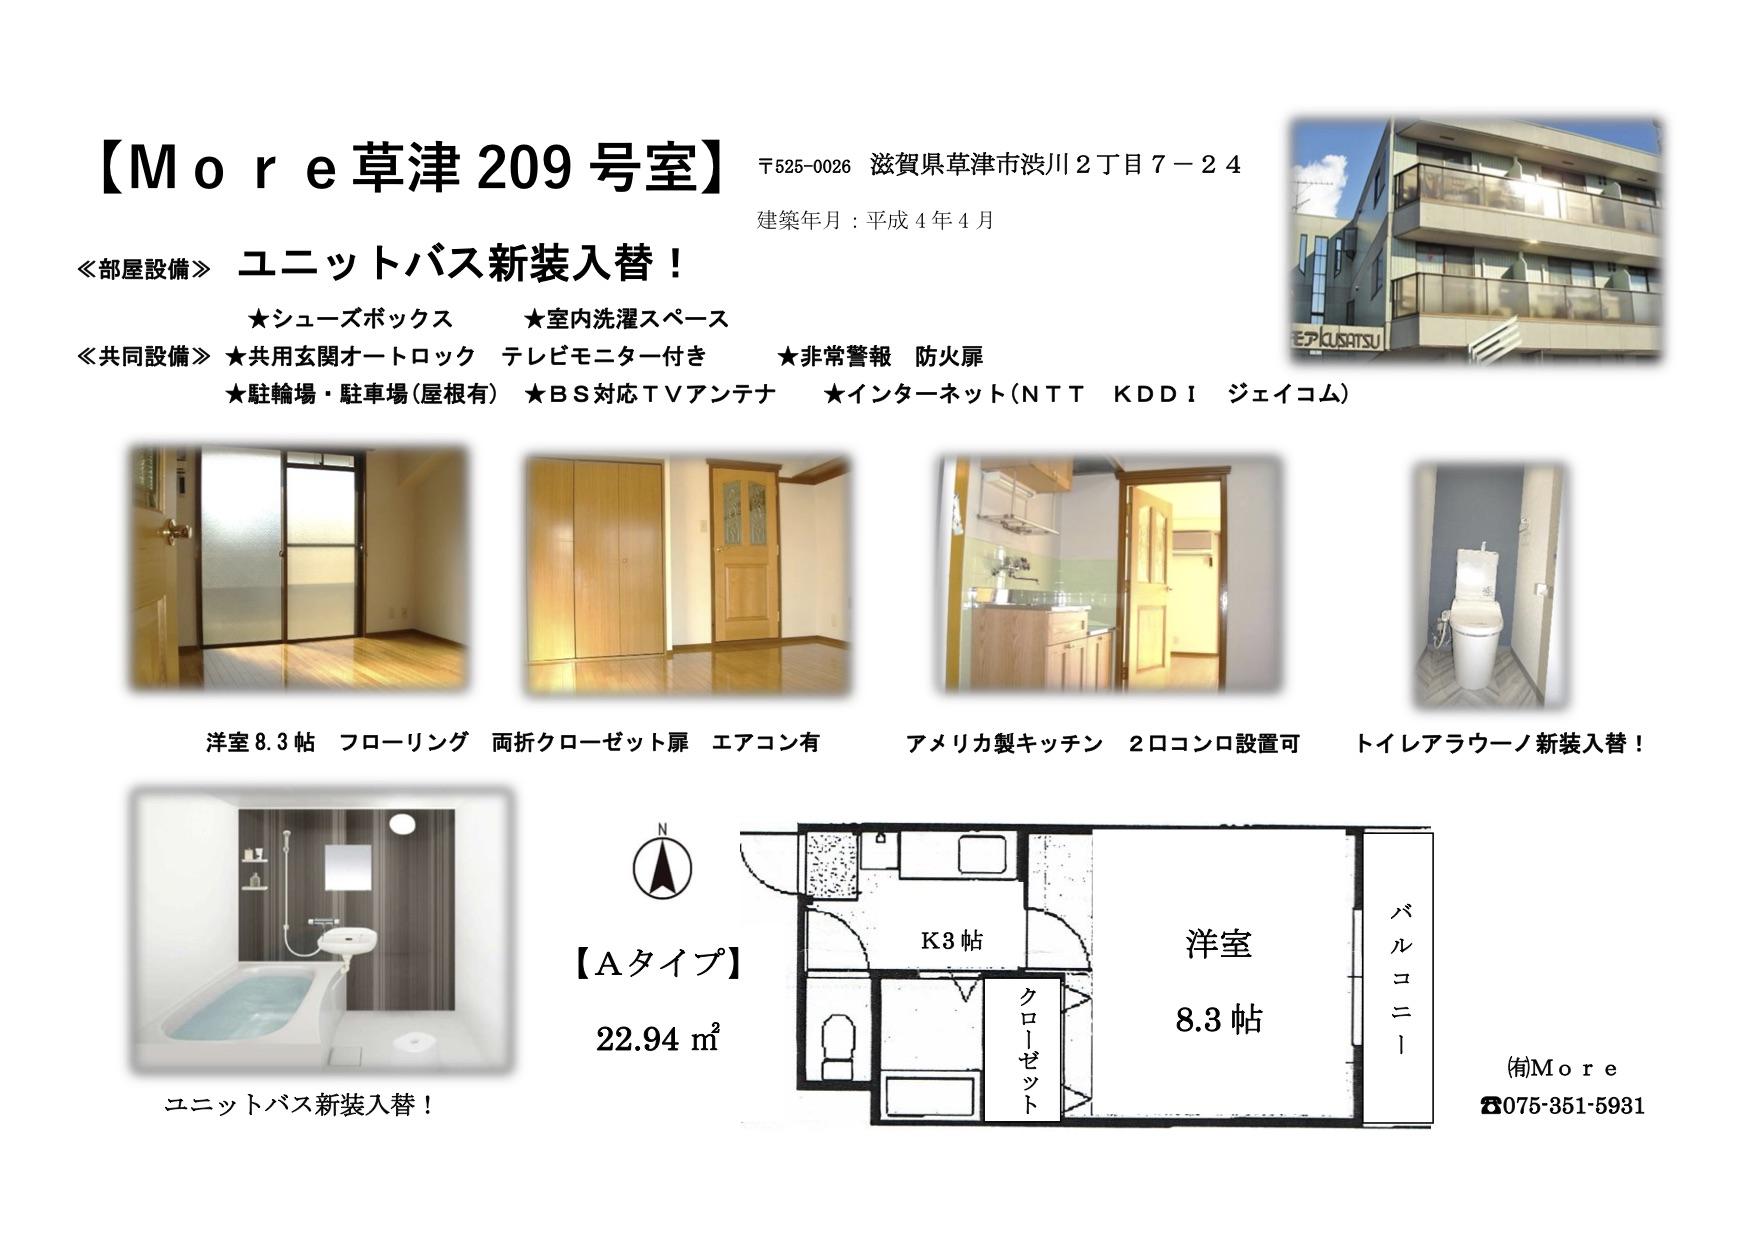 More草津 209号室